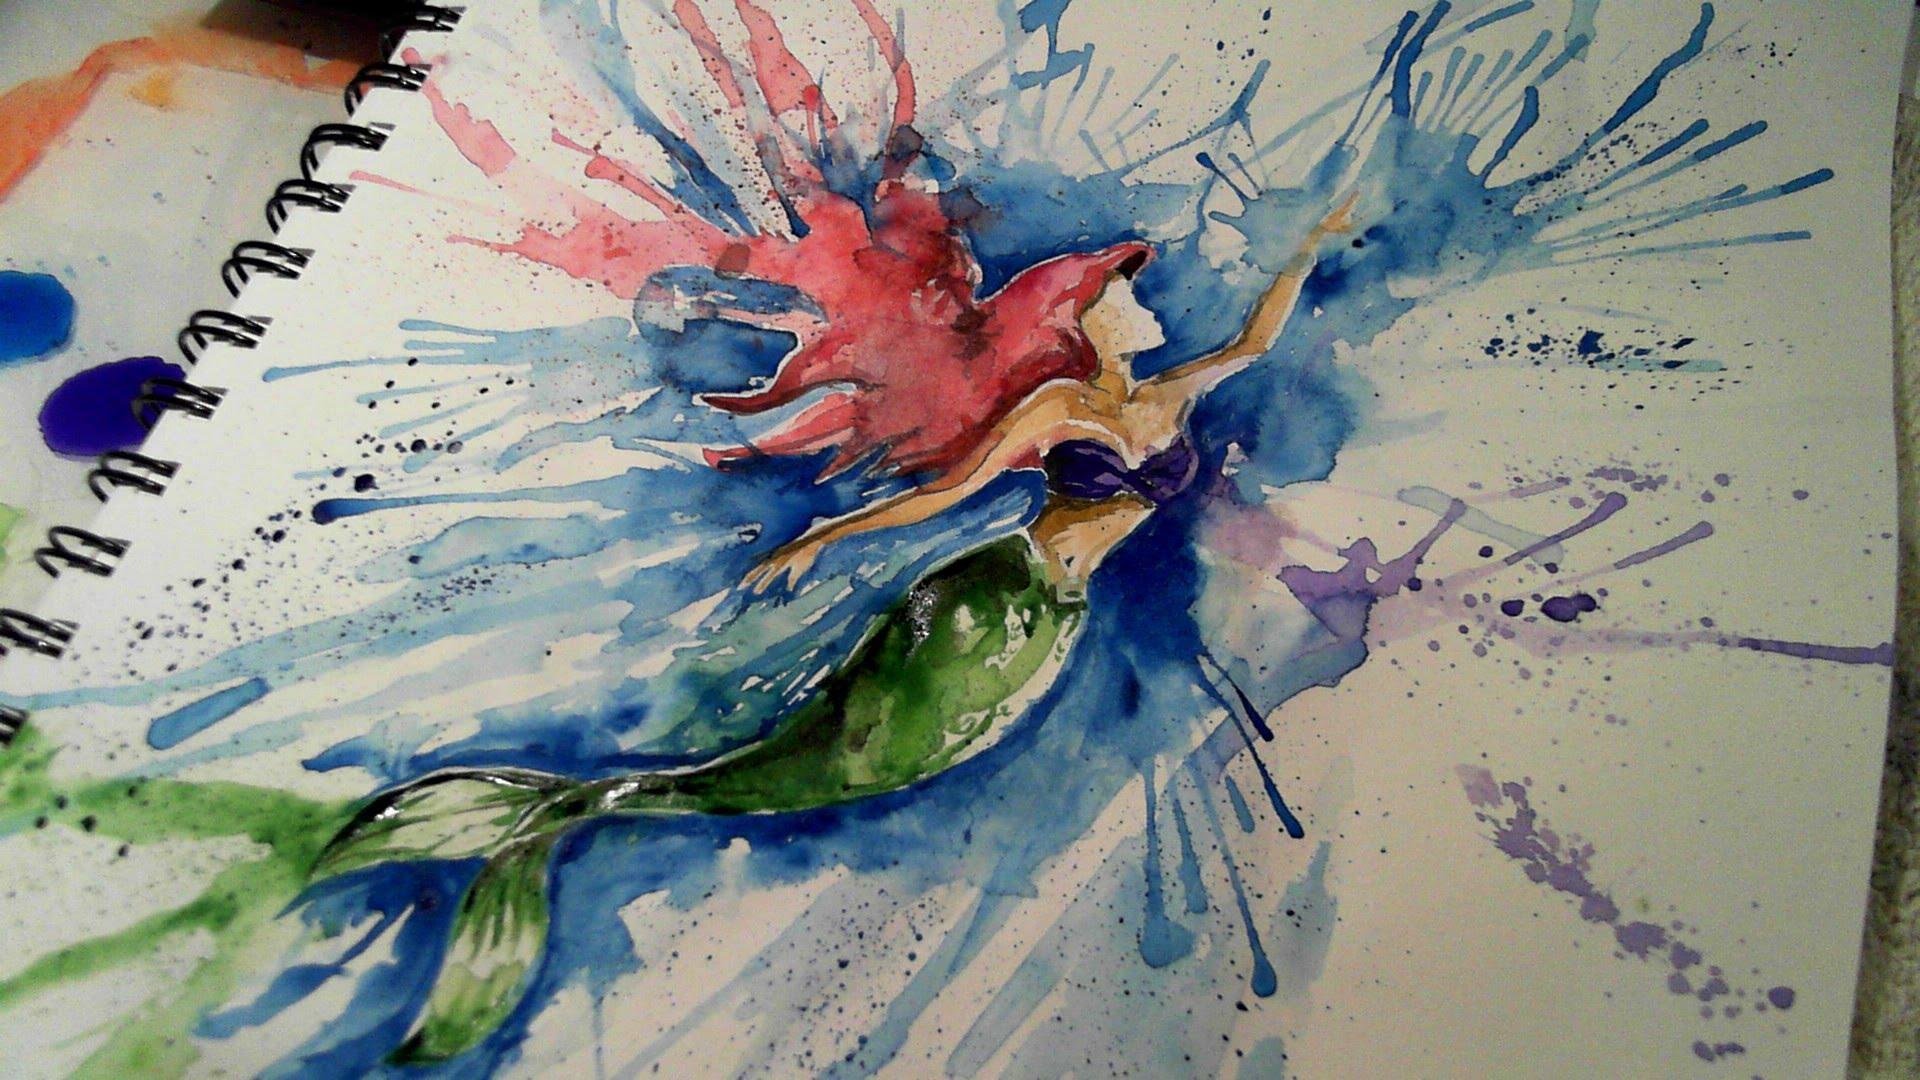 1920x1080 Watercolour Ariel Painting